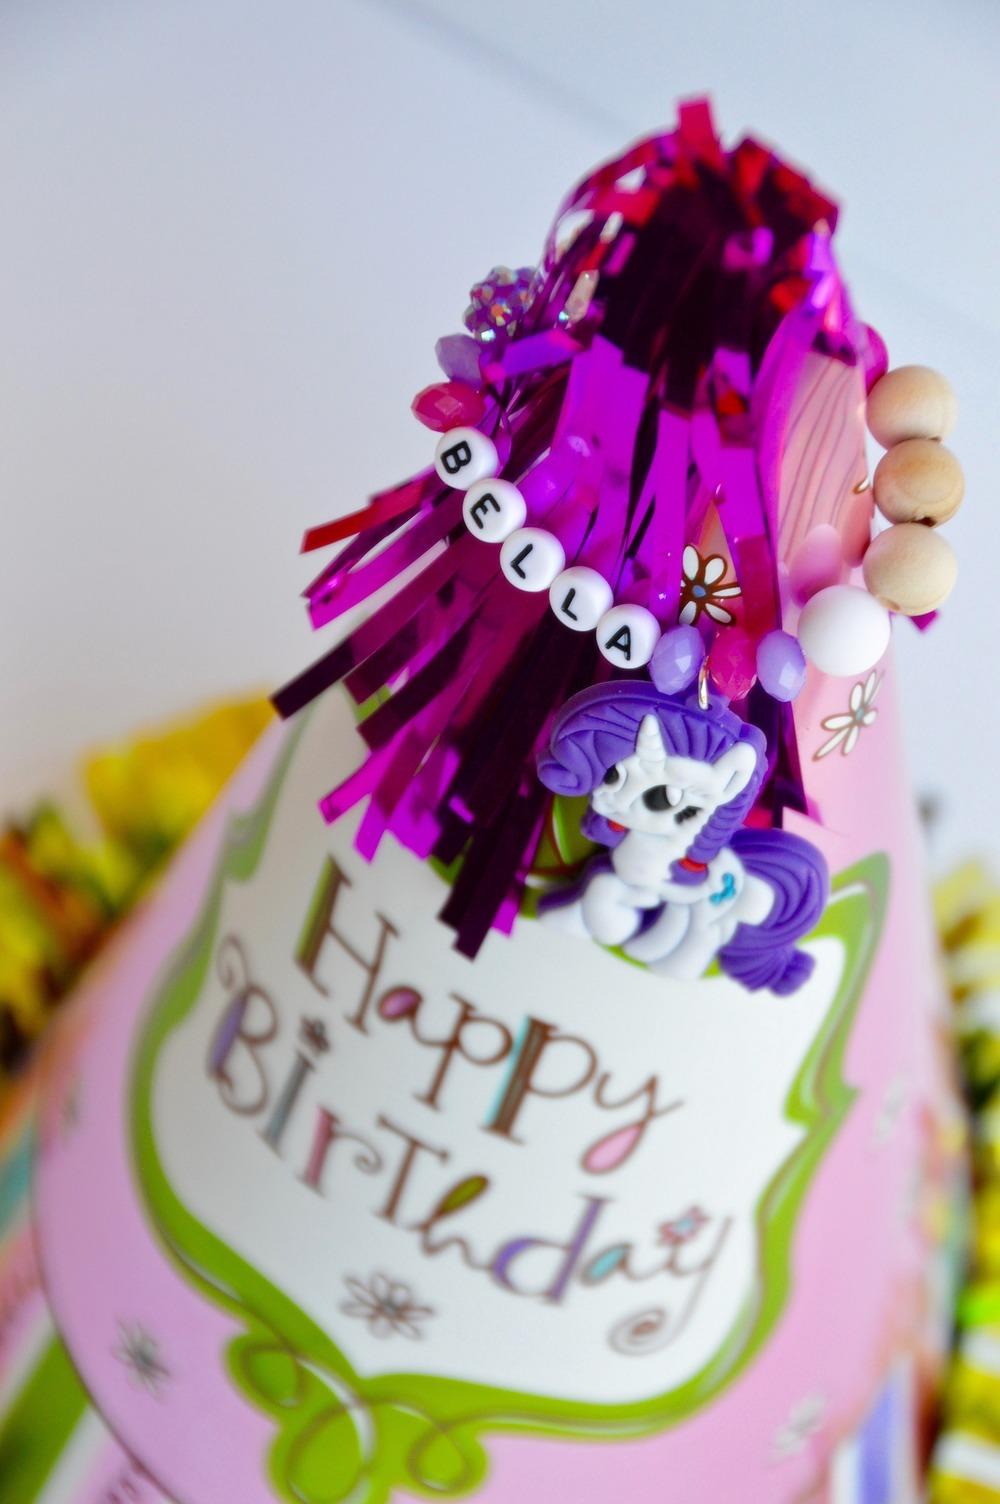 Bella's Birthday Present - Hello Love Kalia - 7 of 9.jpg